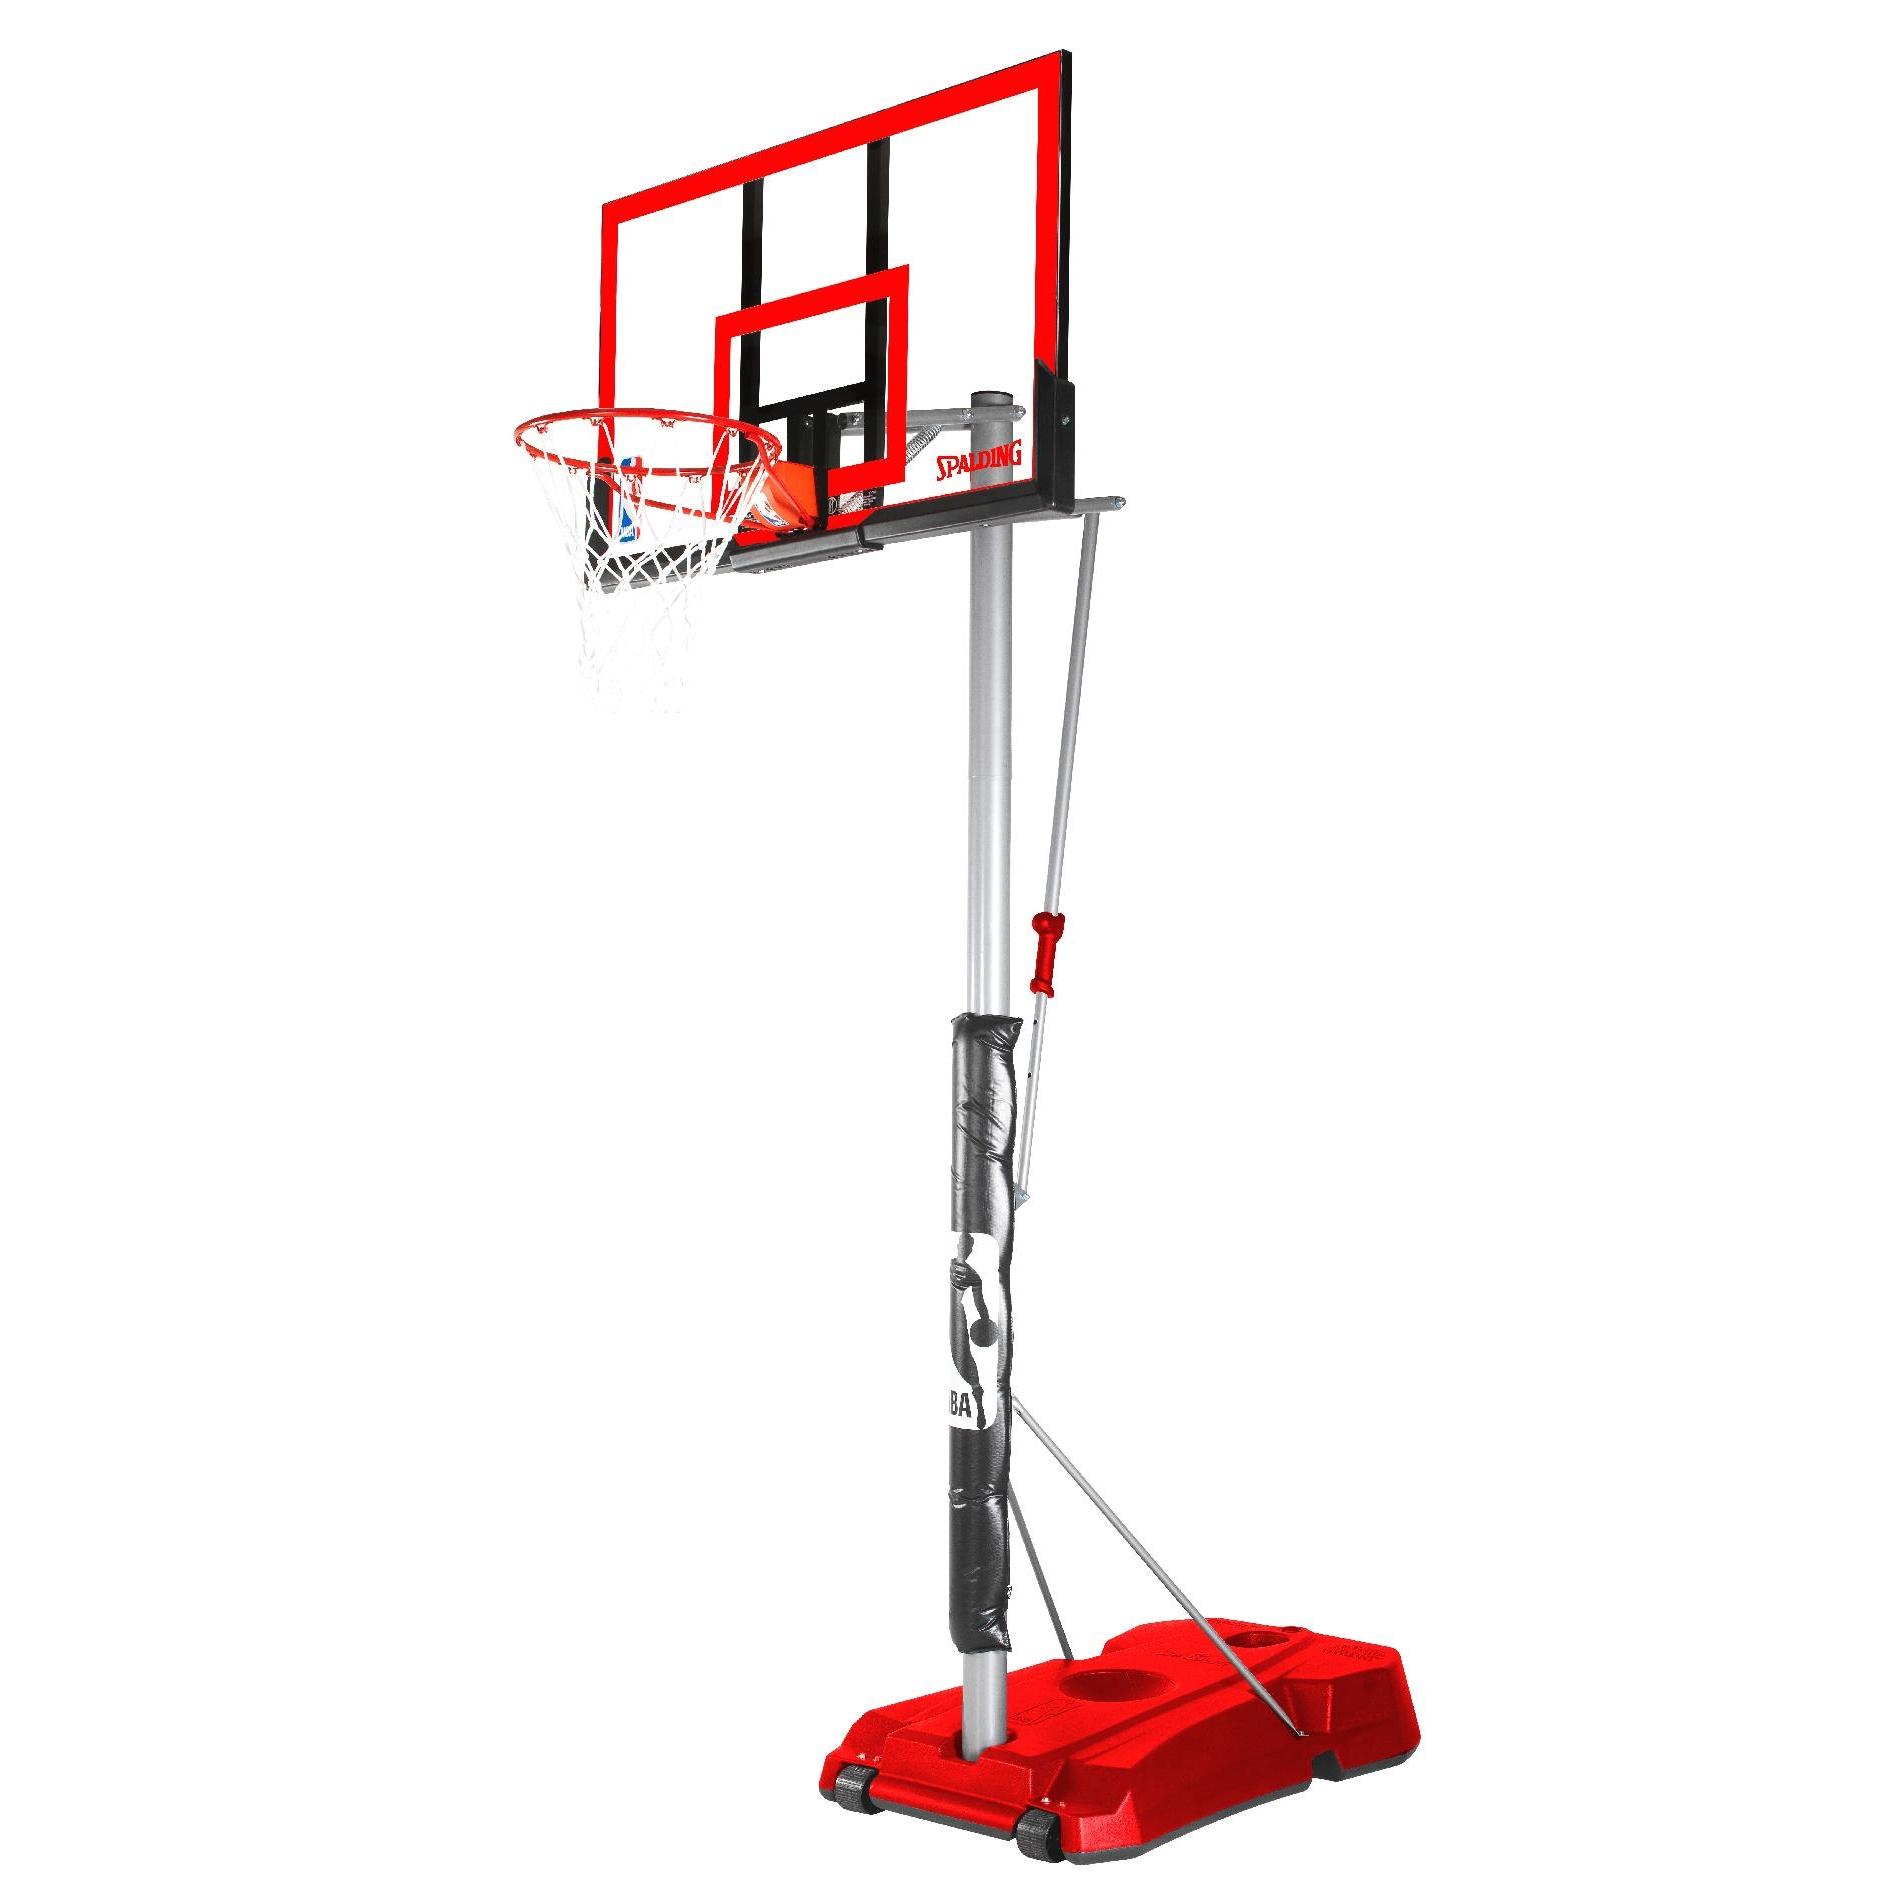 Spalding NBA 52 HERCULES RED Acrylic Portable Basketball